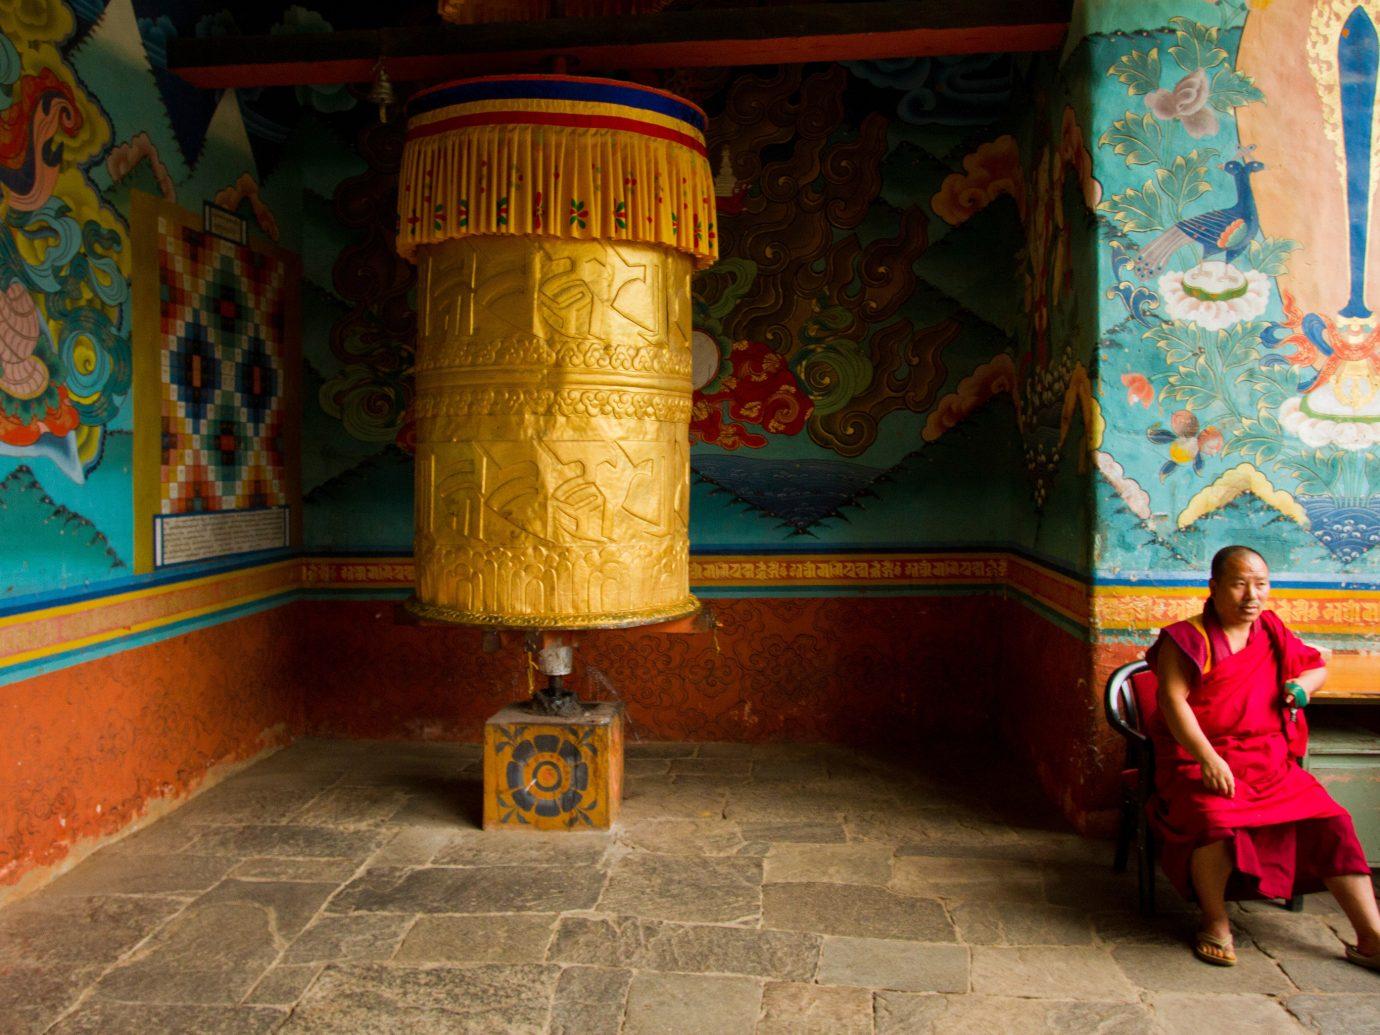 Belize Bhutan Hotels Iran Laos Madagascar Secret Getaways Slovenia Tanzania Trip Ideas Uganda color hindu temple temple ancient history shrine place of worship wat tradition religion colorful